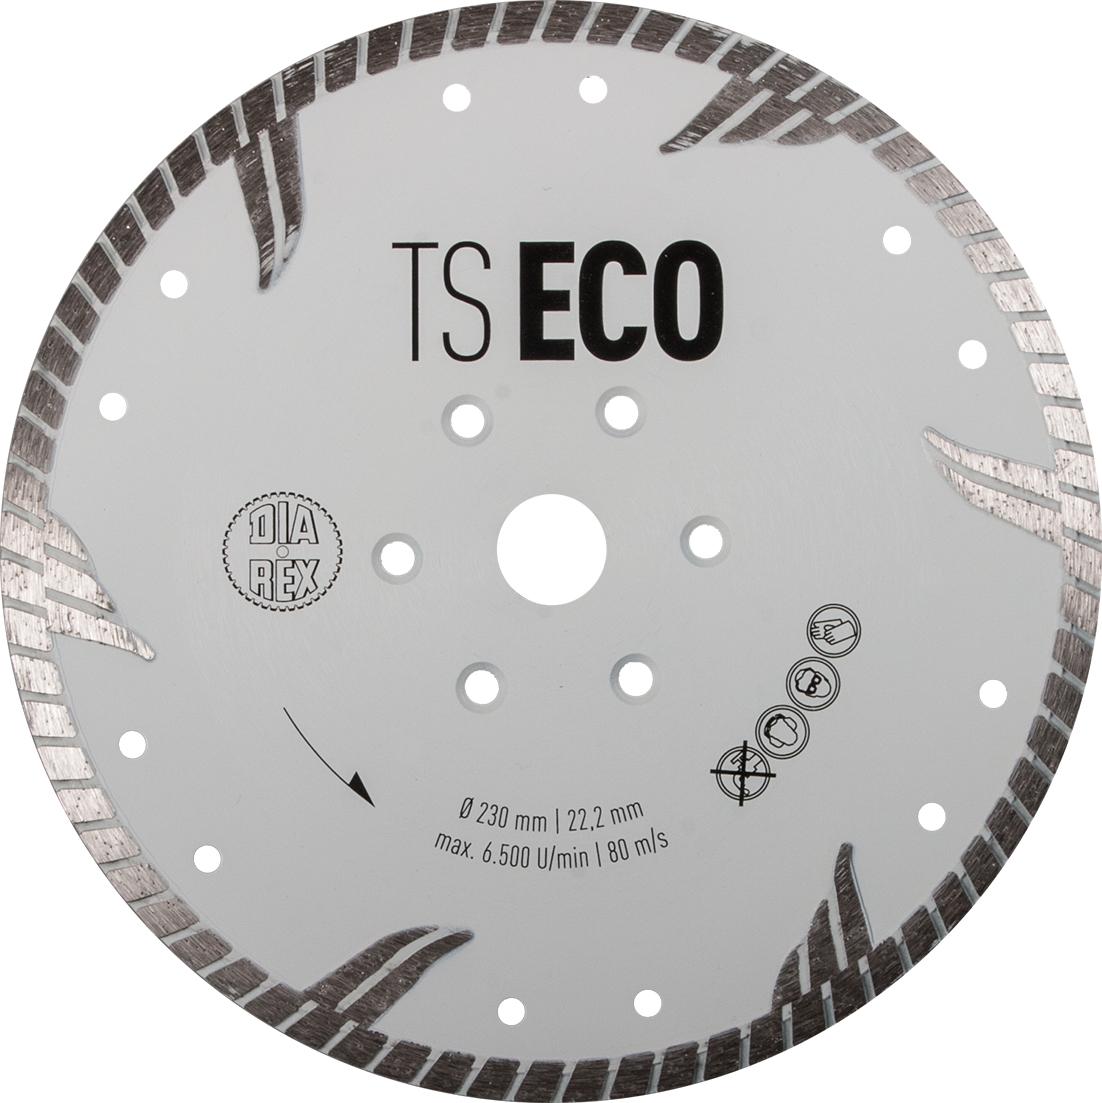 DIAREX Trennscheibe ECO ø 230 mm